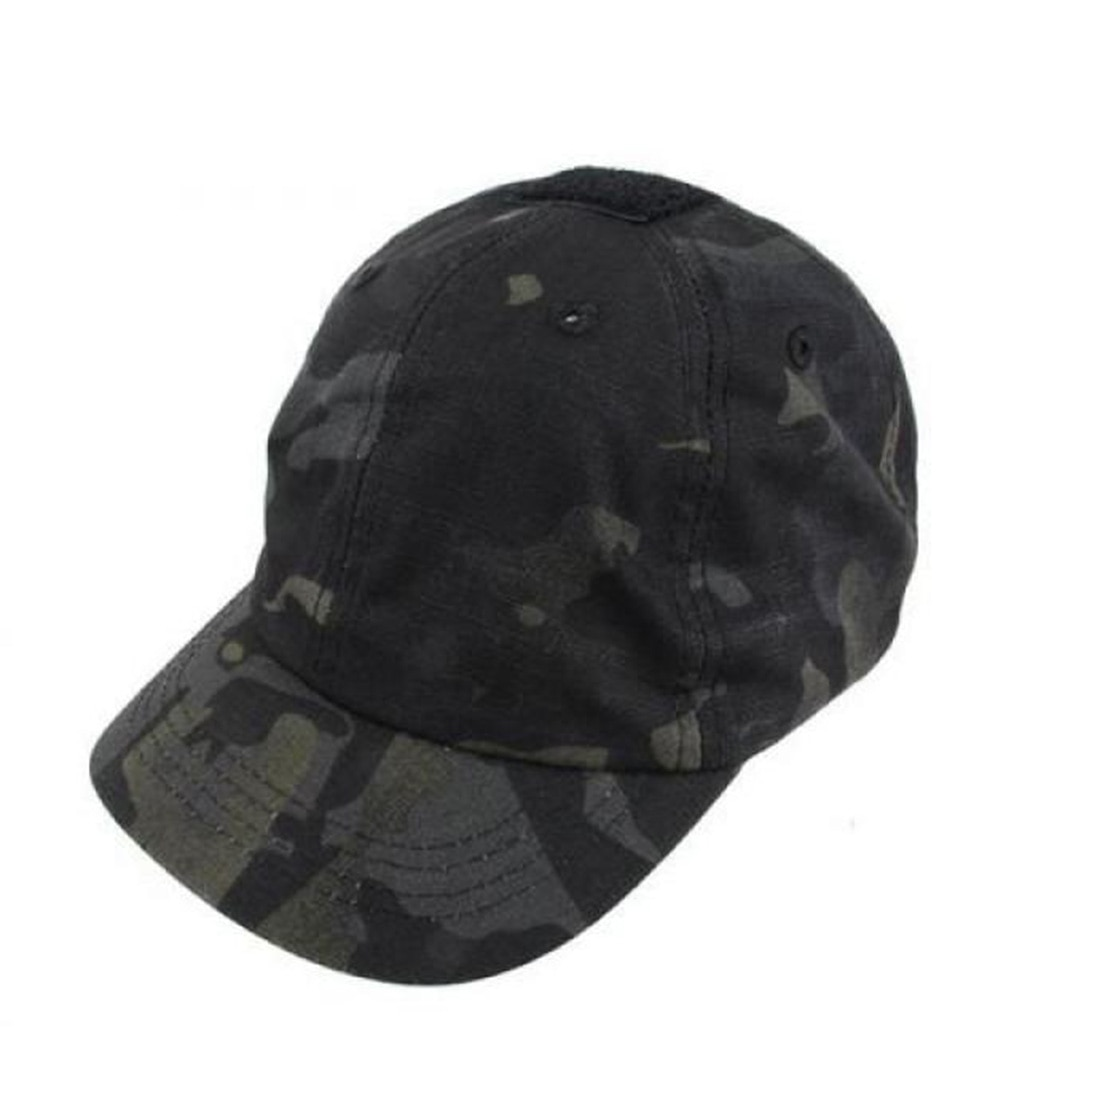 TMC-2479 التكتيكية الانظار قبعة قبعة للرجال النساء في الهواء الطلق تكتيكات اكسسوارات-MCBK (م)